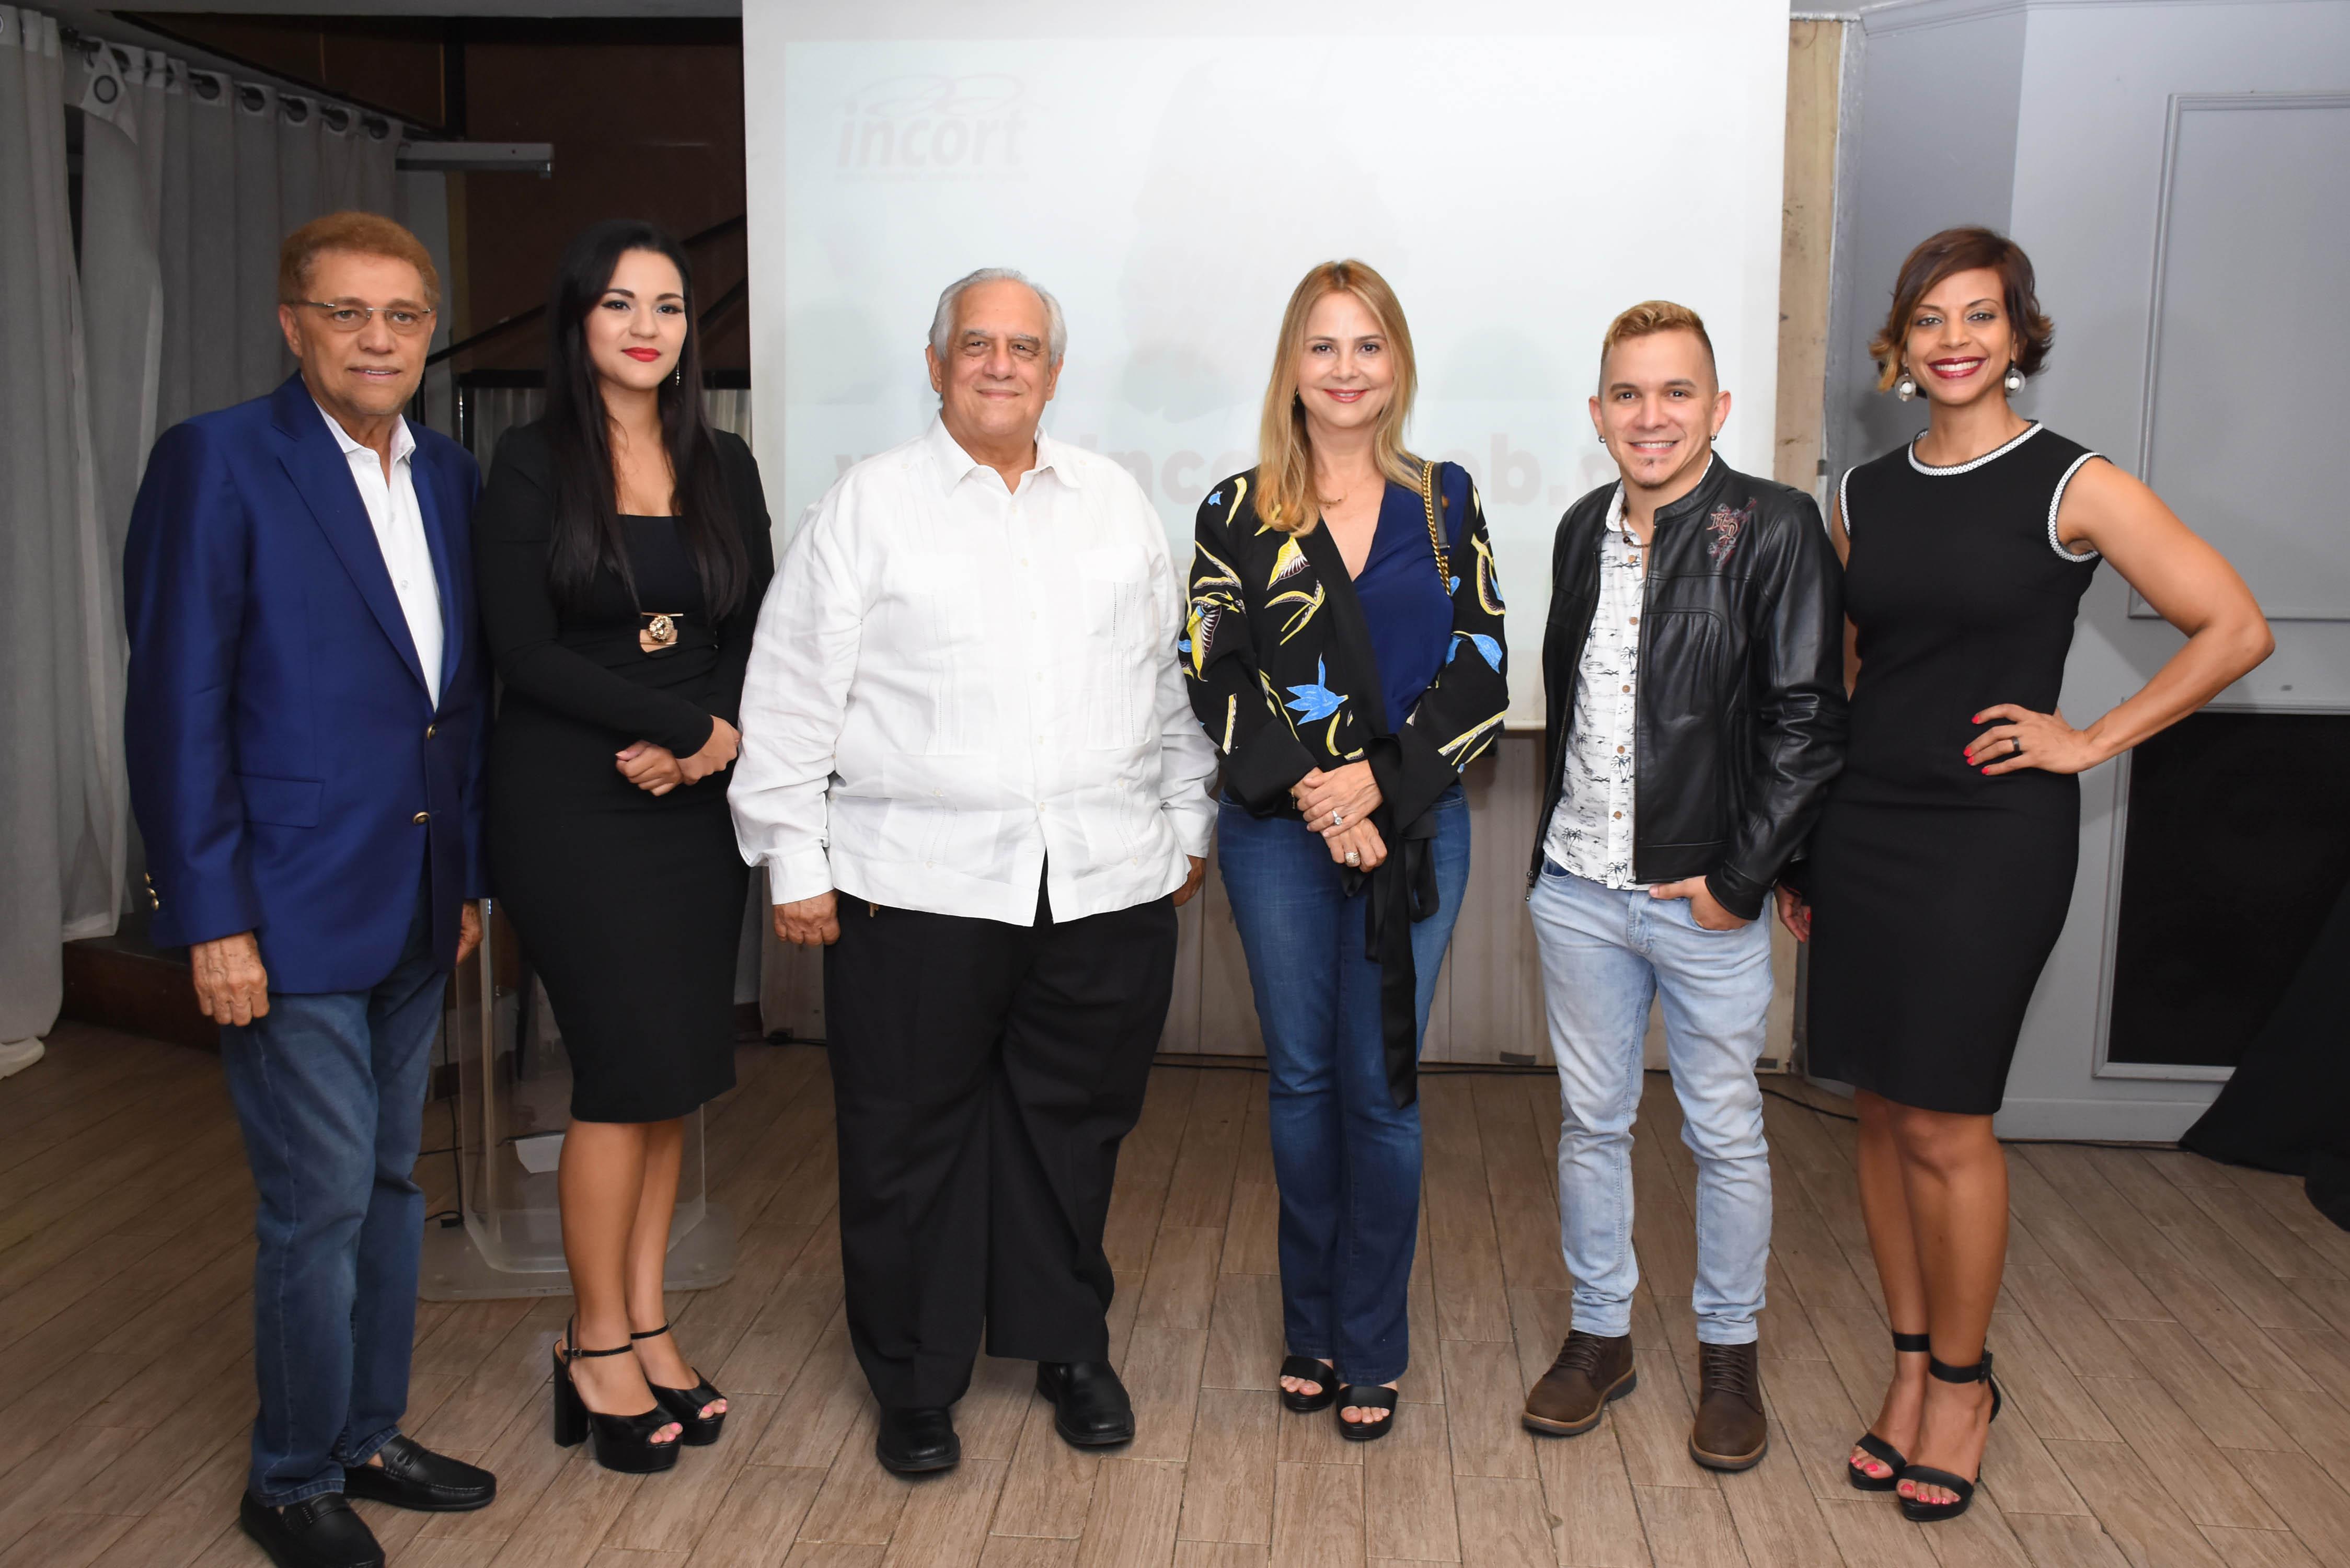 Comunicadores y artistas se unen para promover donación de órganos